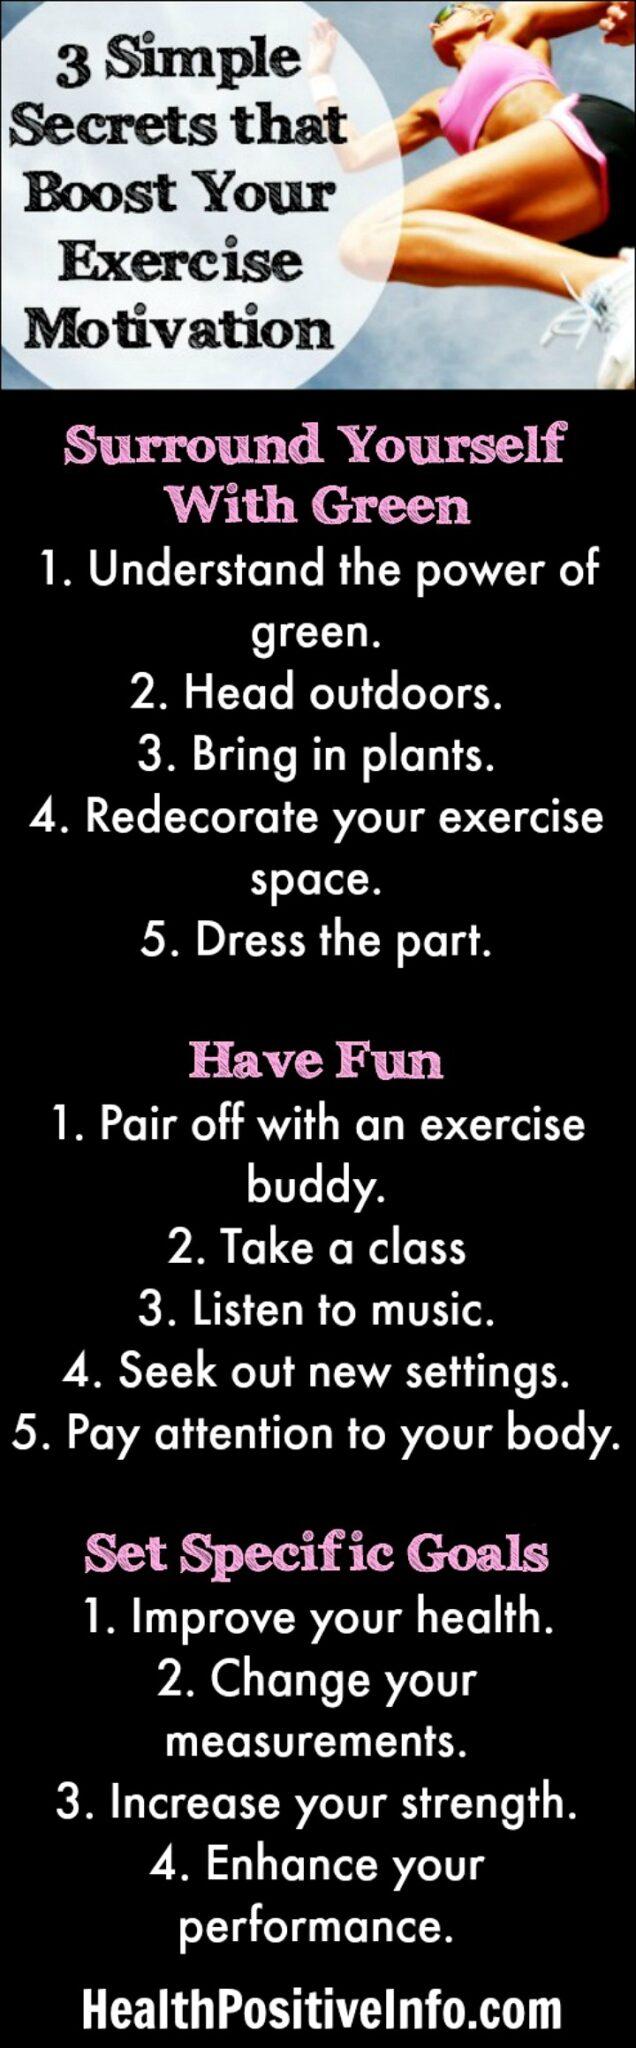 3 Simple Secrets that Boost Exercise Motivation - https://healthpositiveinfo.com/3-simple-secrets-that-boost-your-exercise-motivation.html